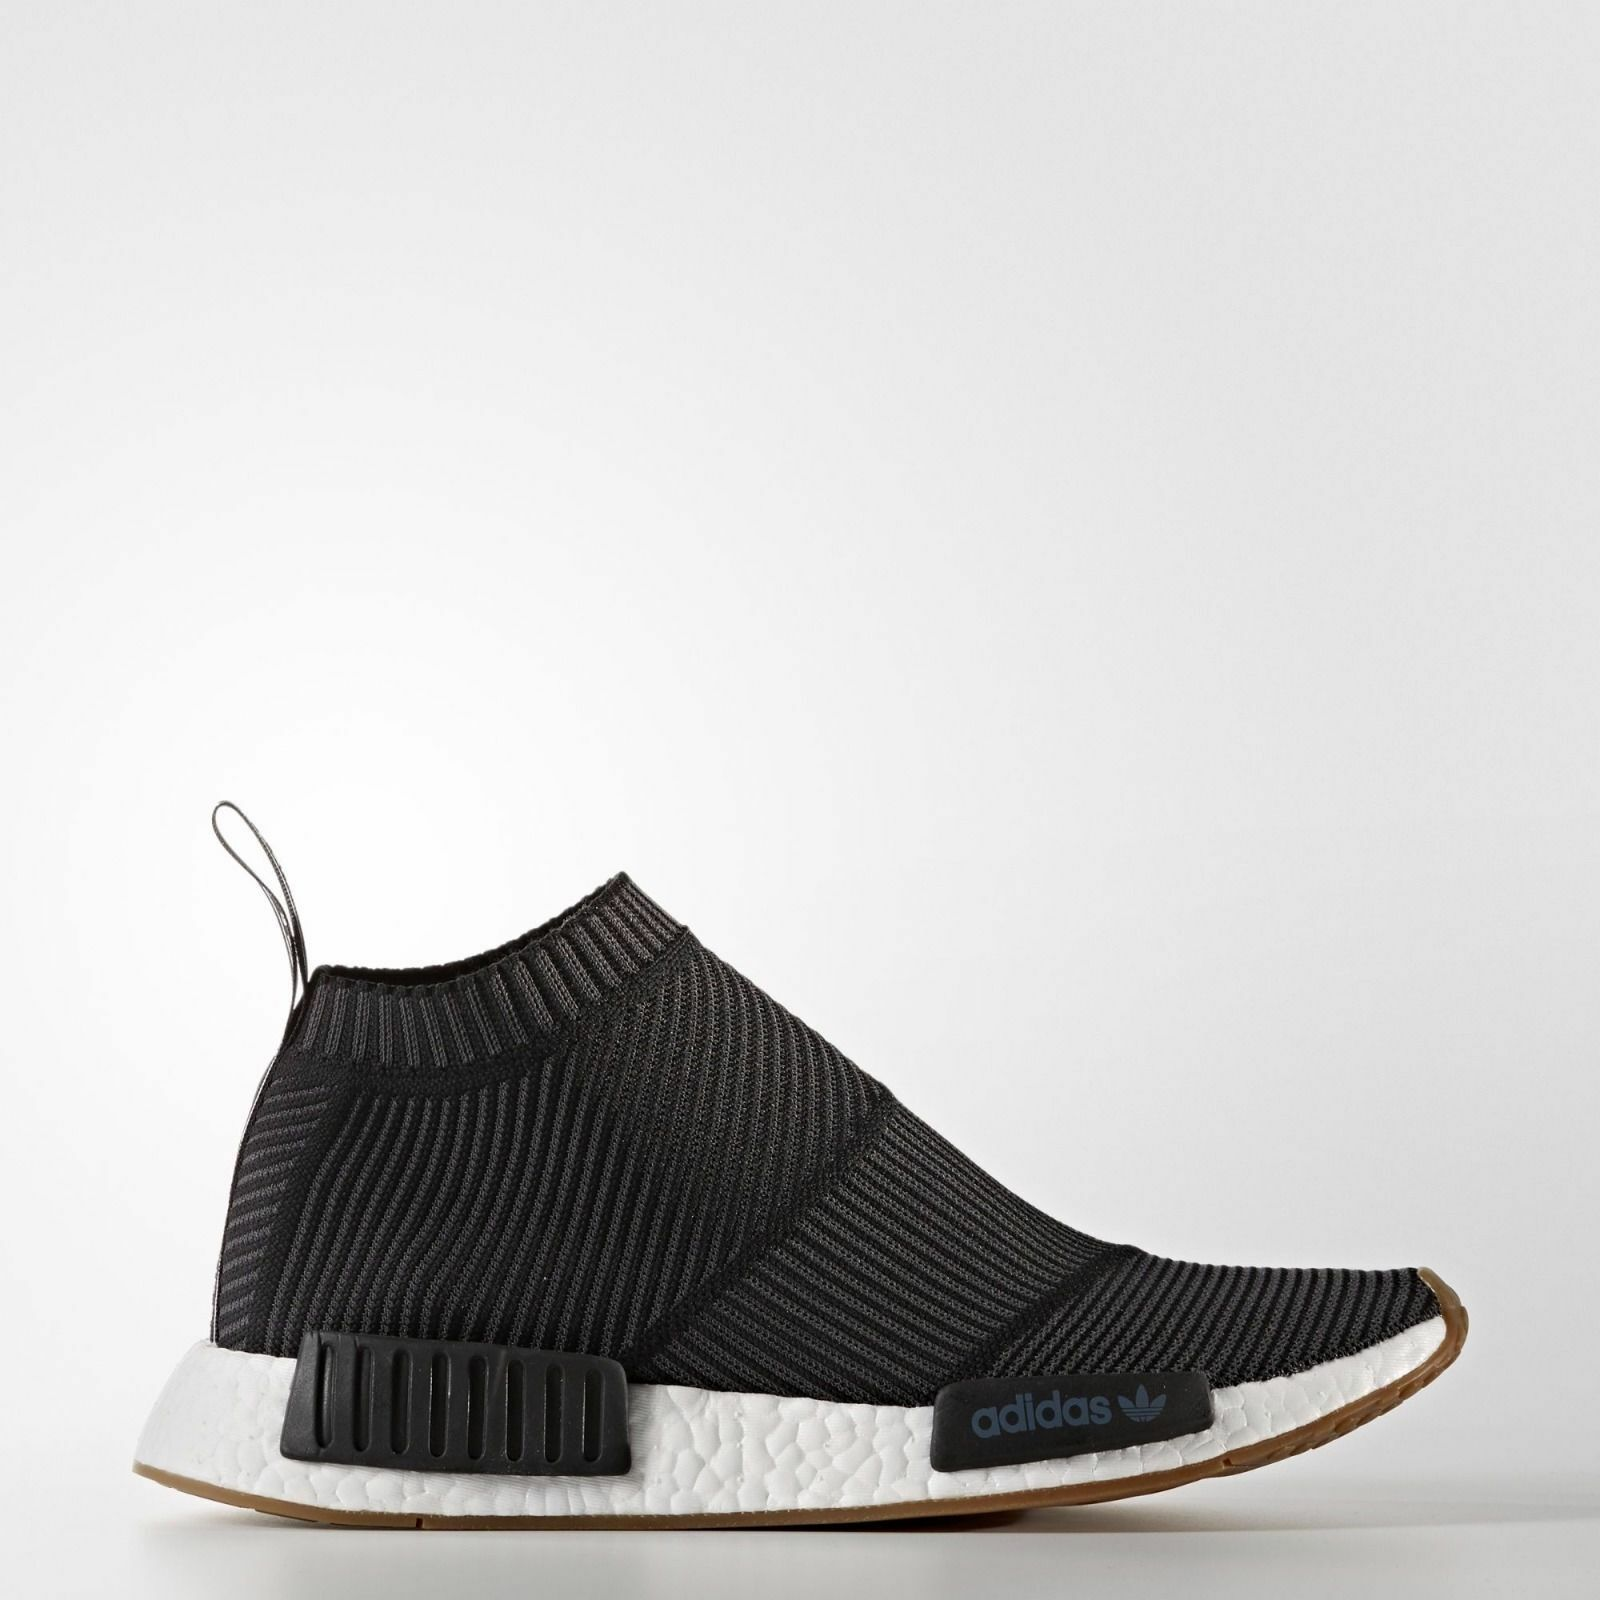 Adidas Men's NMD_CS1 PK Primeknit Core Black Gum BA7209 Comfortable